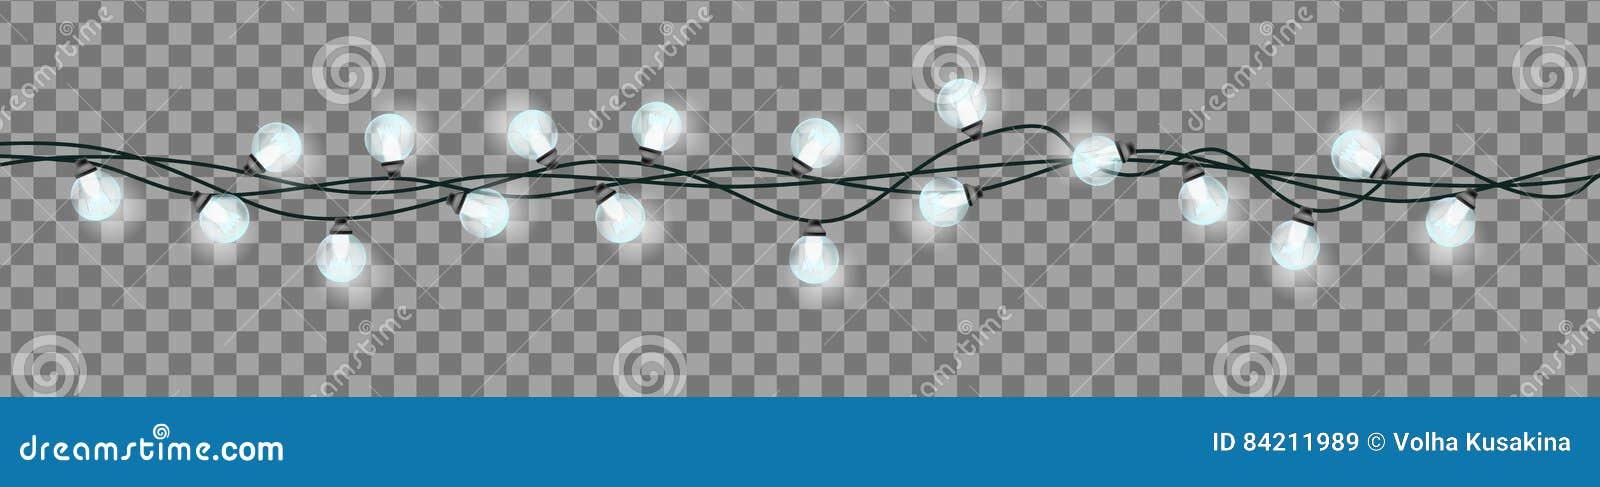 Christmas Garland On A Transparent Background Stock Illustration